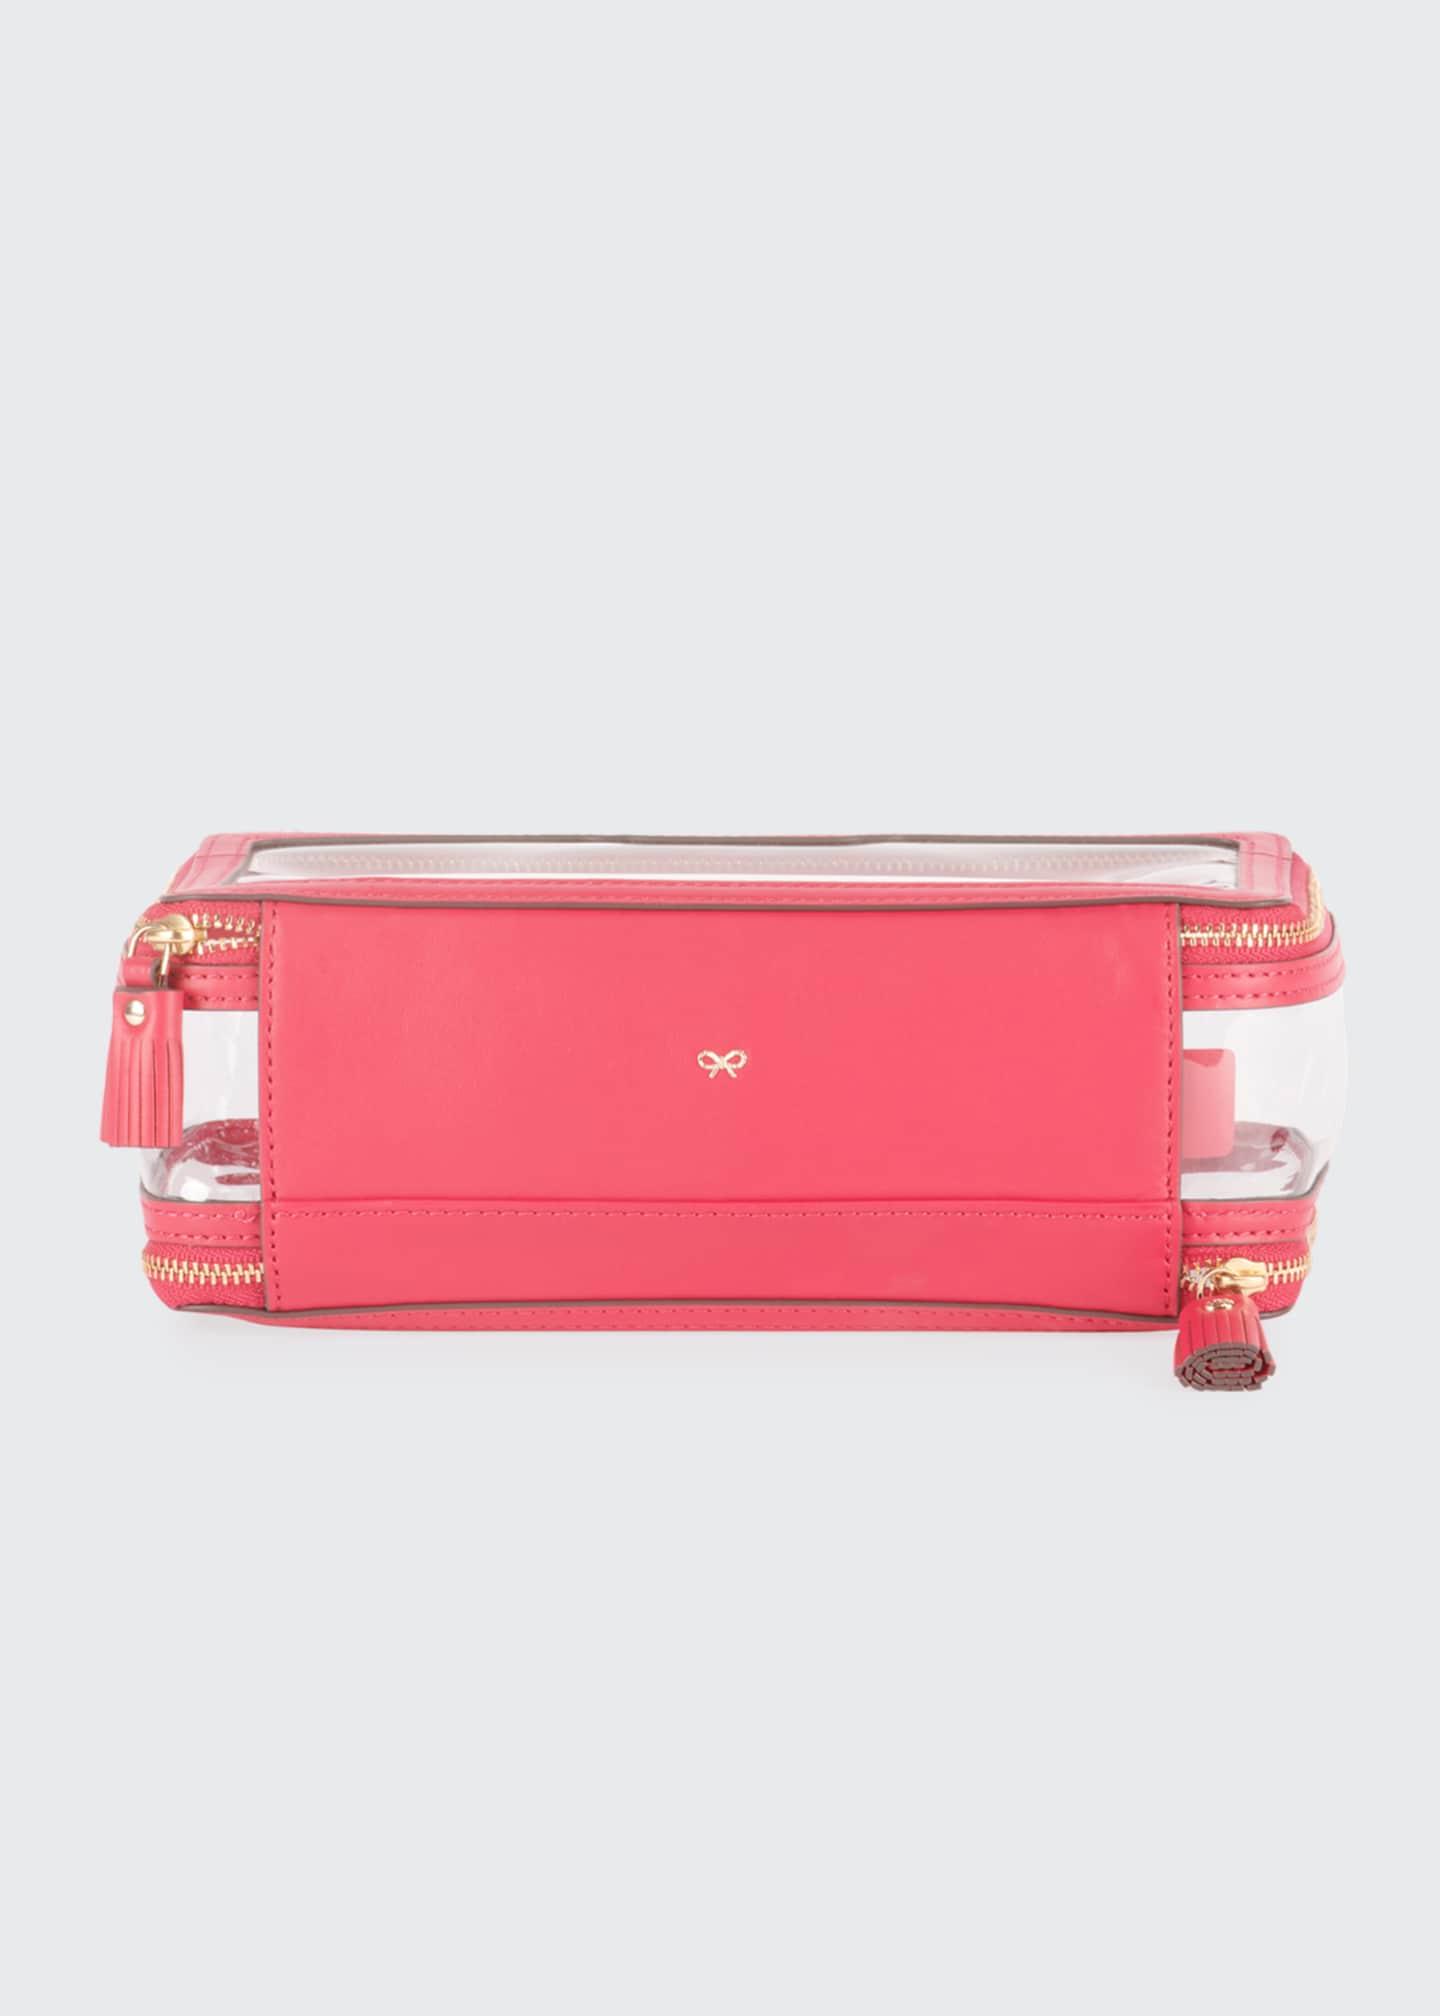 Anya Hindmarch Inflight See-Through Cosmetics Bag, Pink - Bergdorf Goodman